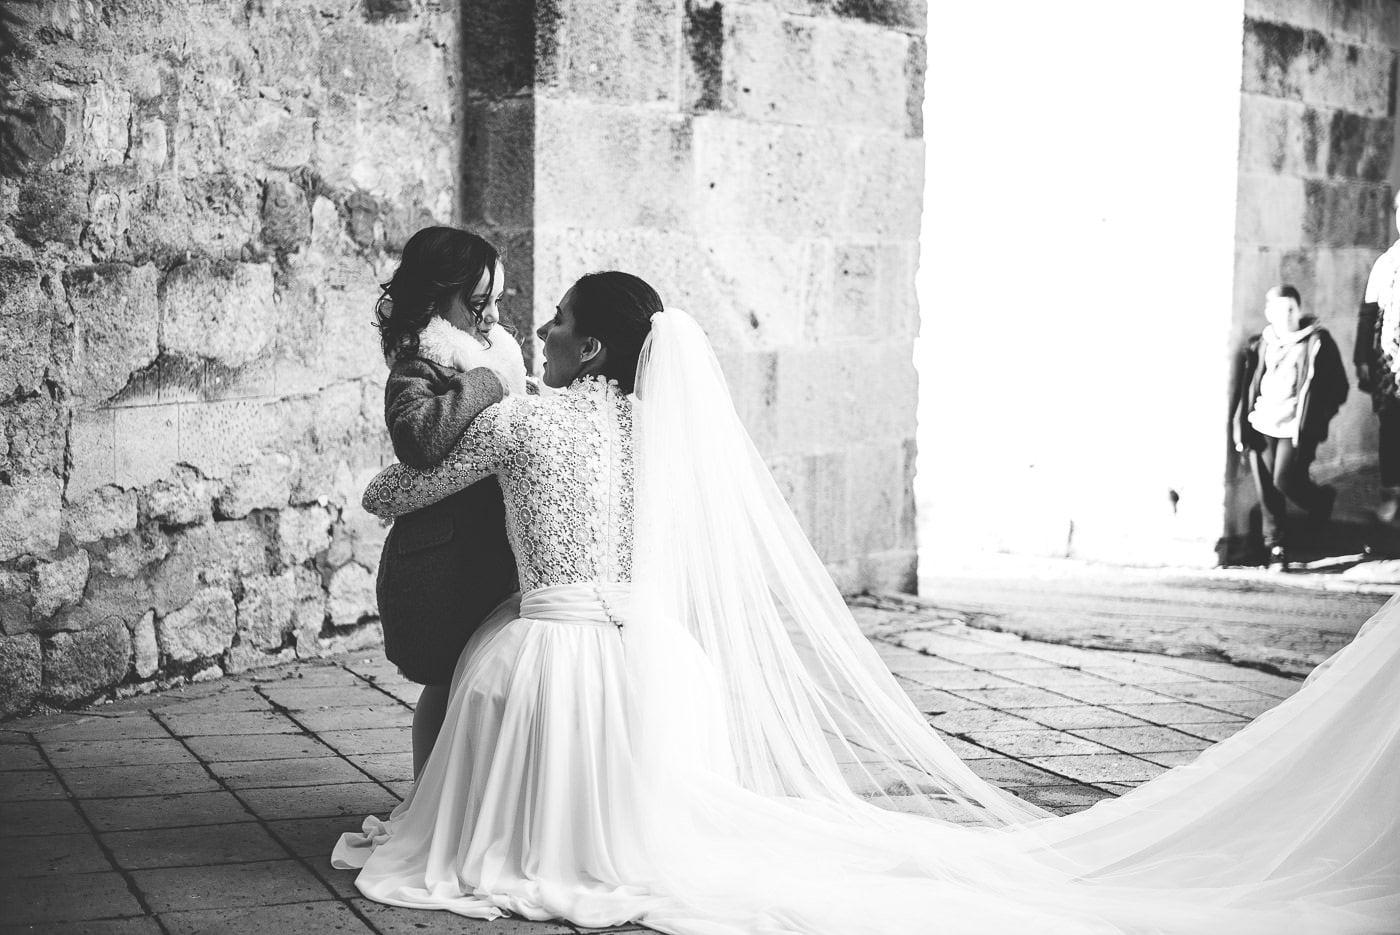 Matrimonio Giulia & Alessandro 28_12 – Alessio Nobili Photographer-18